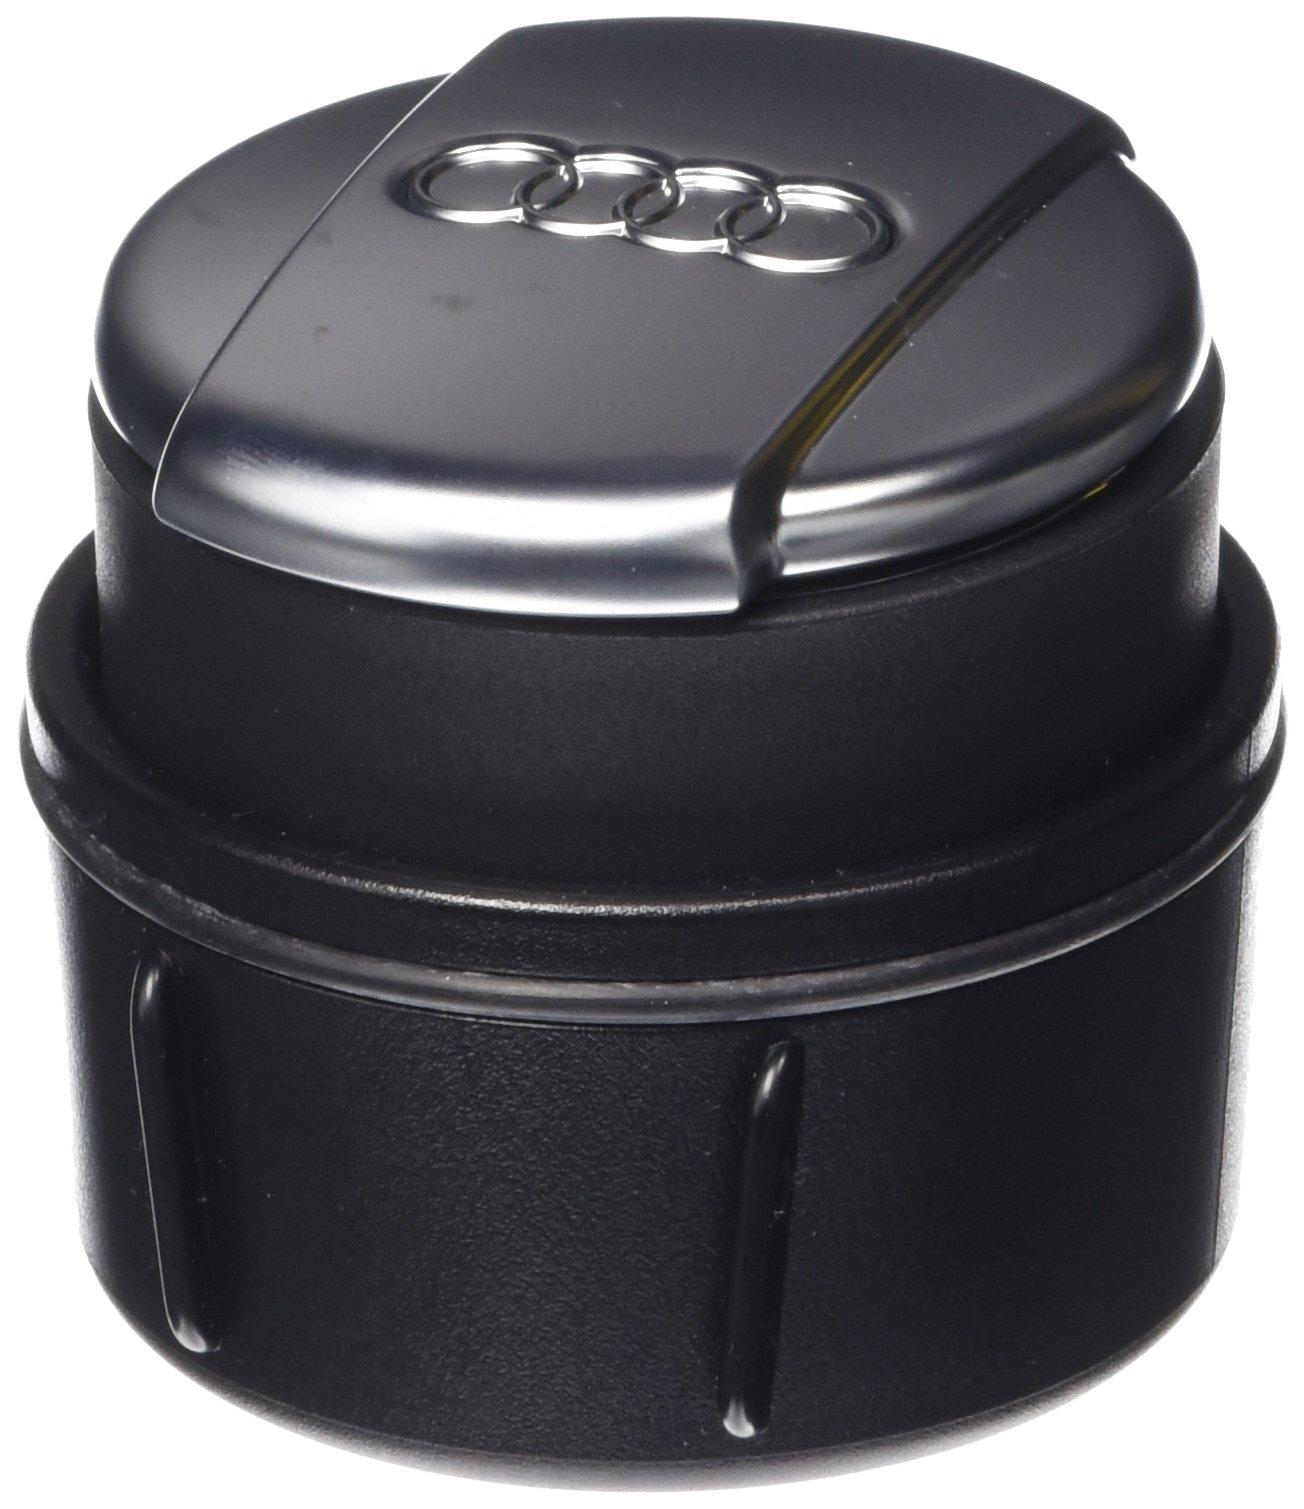 Genuine Audi 420087017 Cup Holder Ashtray